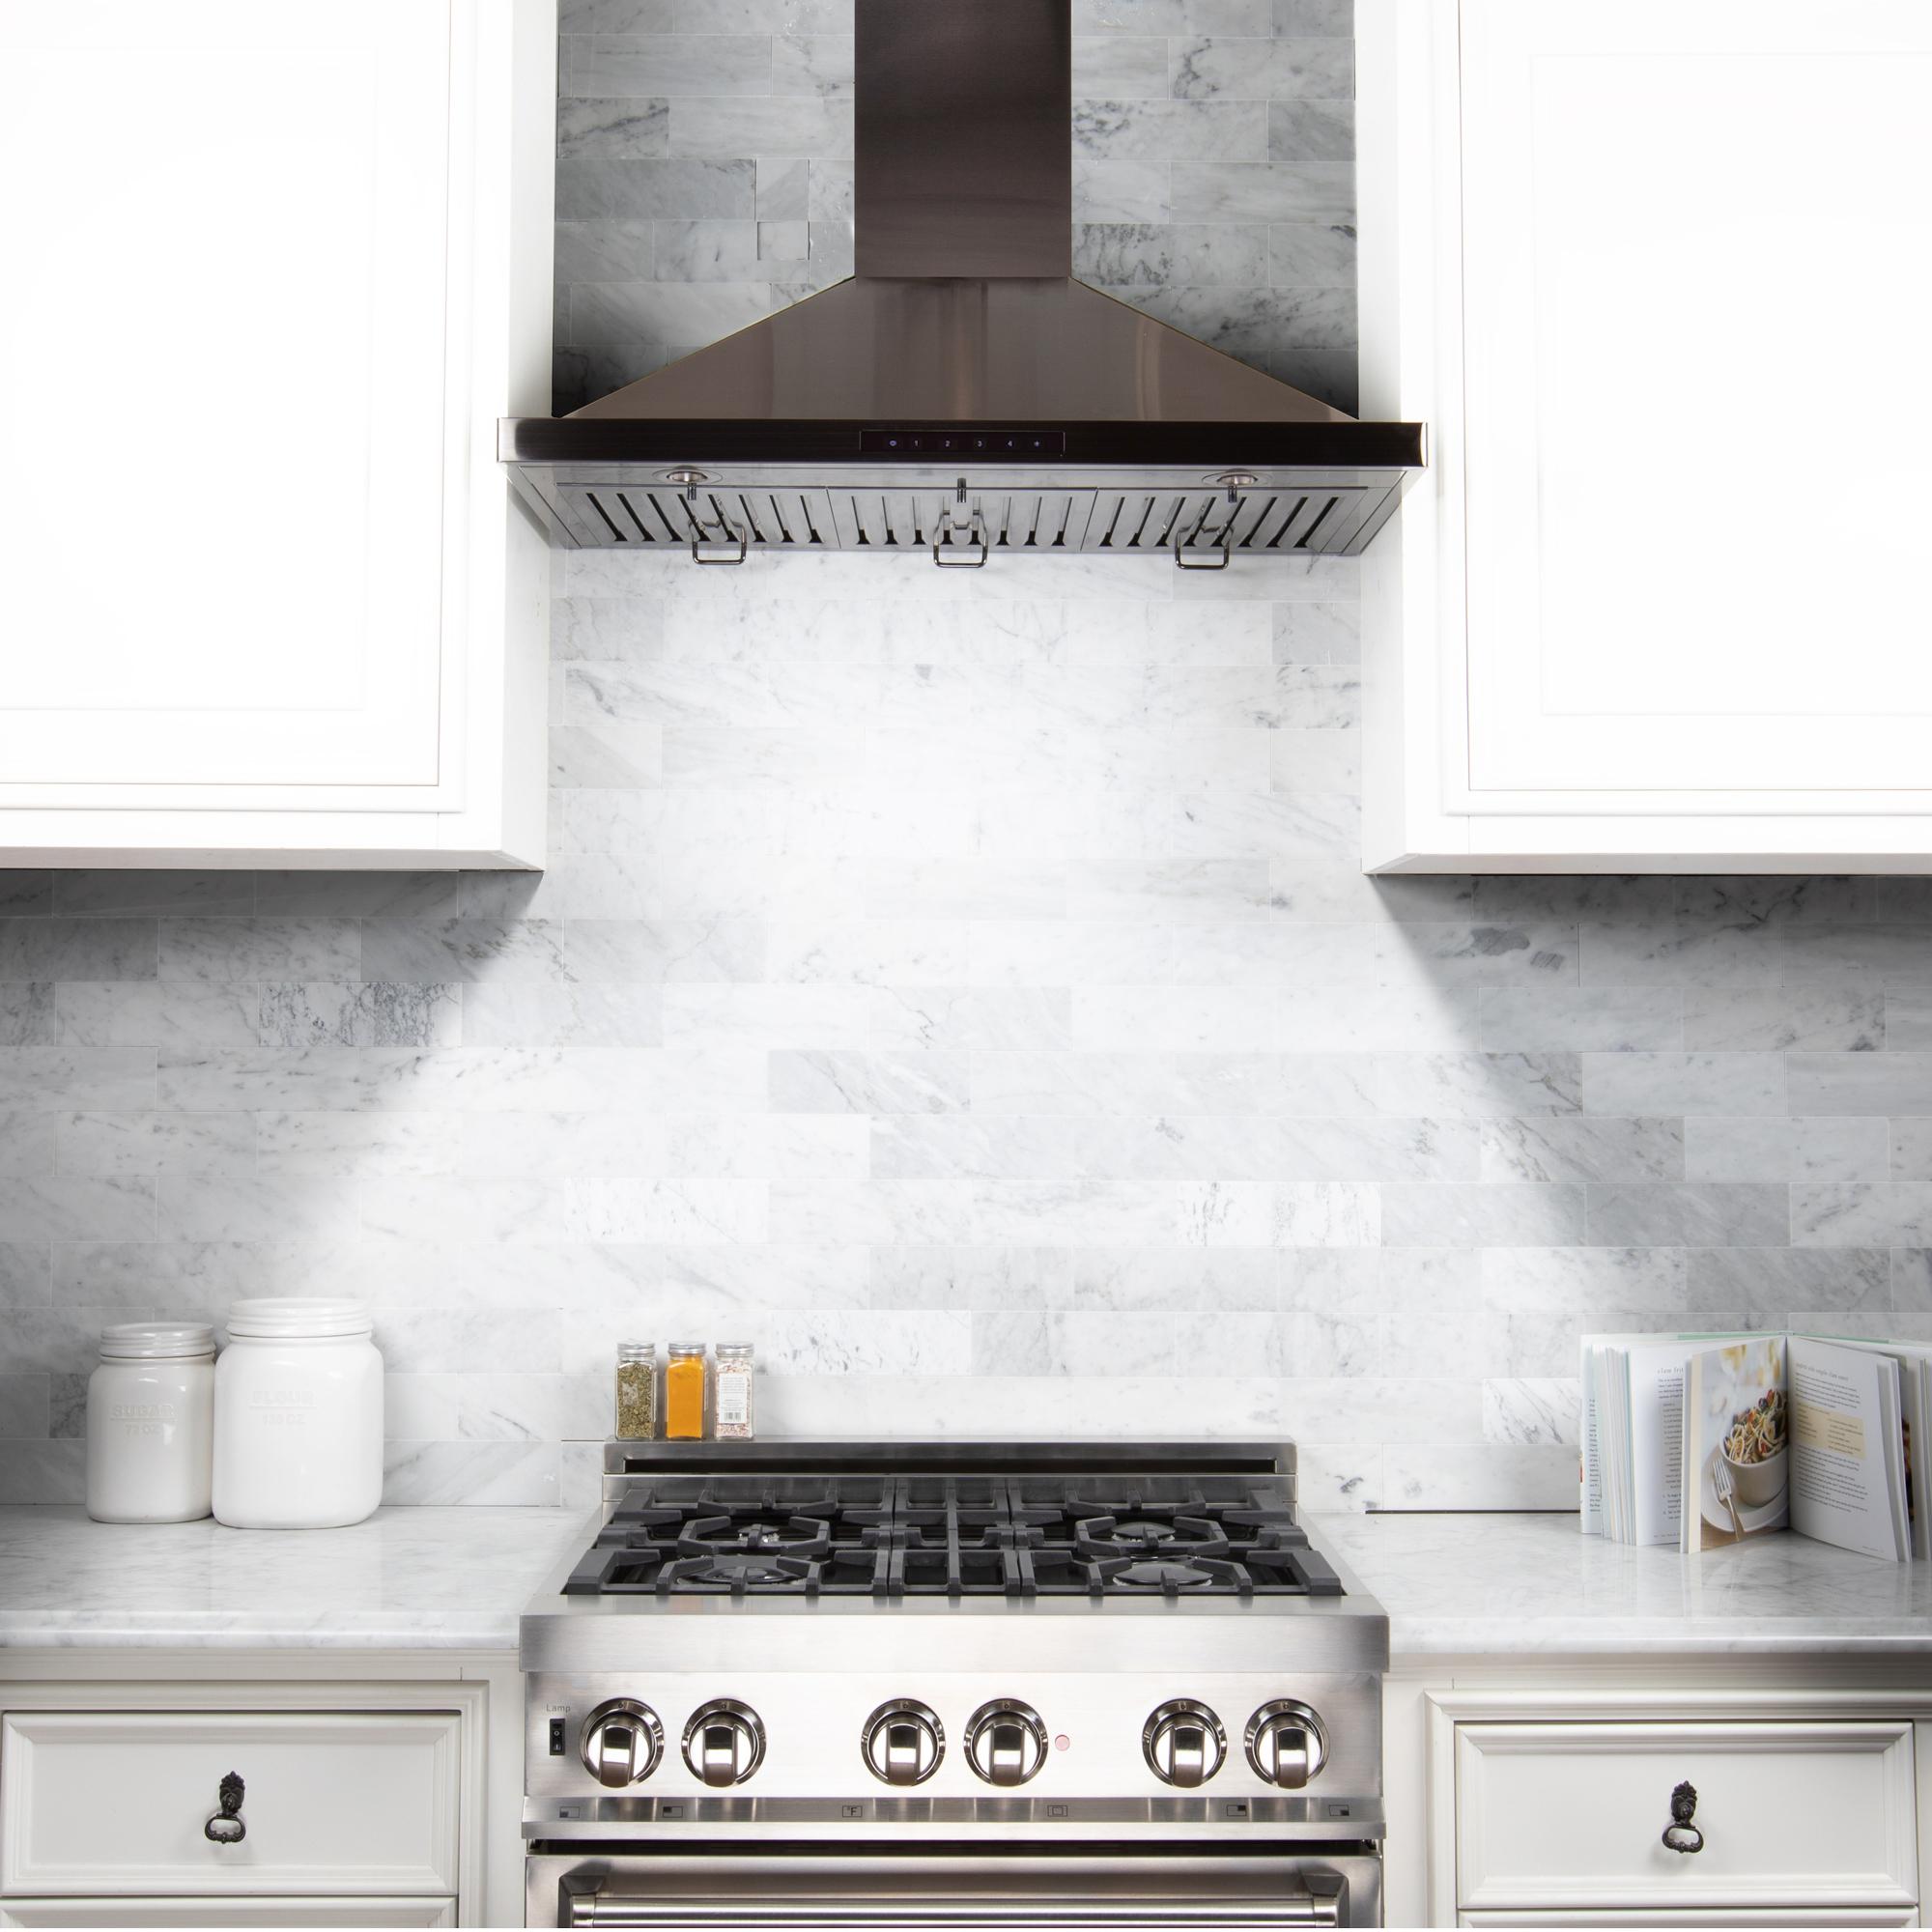 zline-black-stainless-steel-wall-mounted-range-hood-BSKBN_Kitchen3.jpg